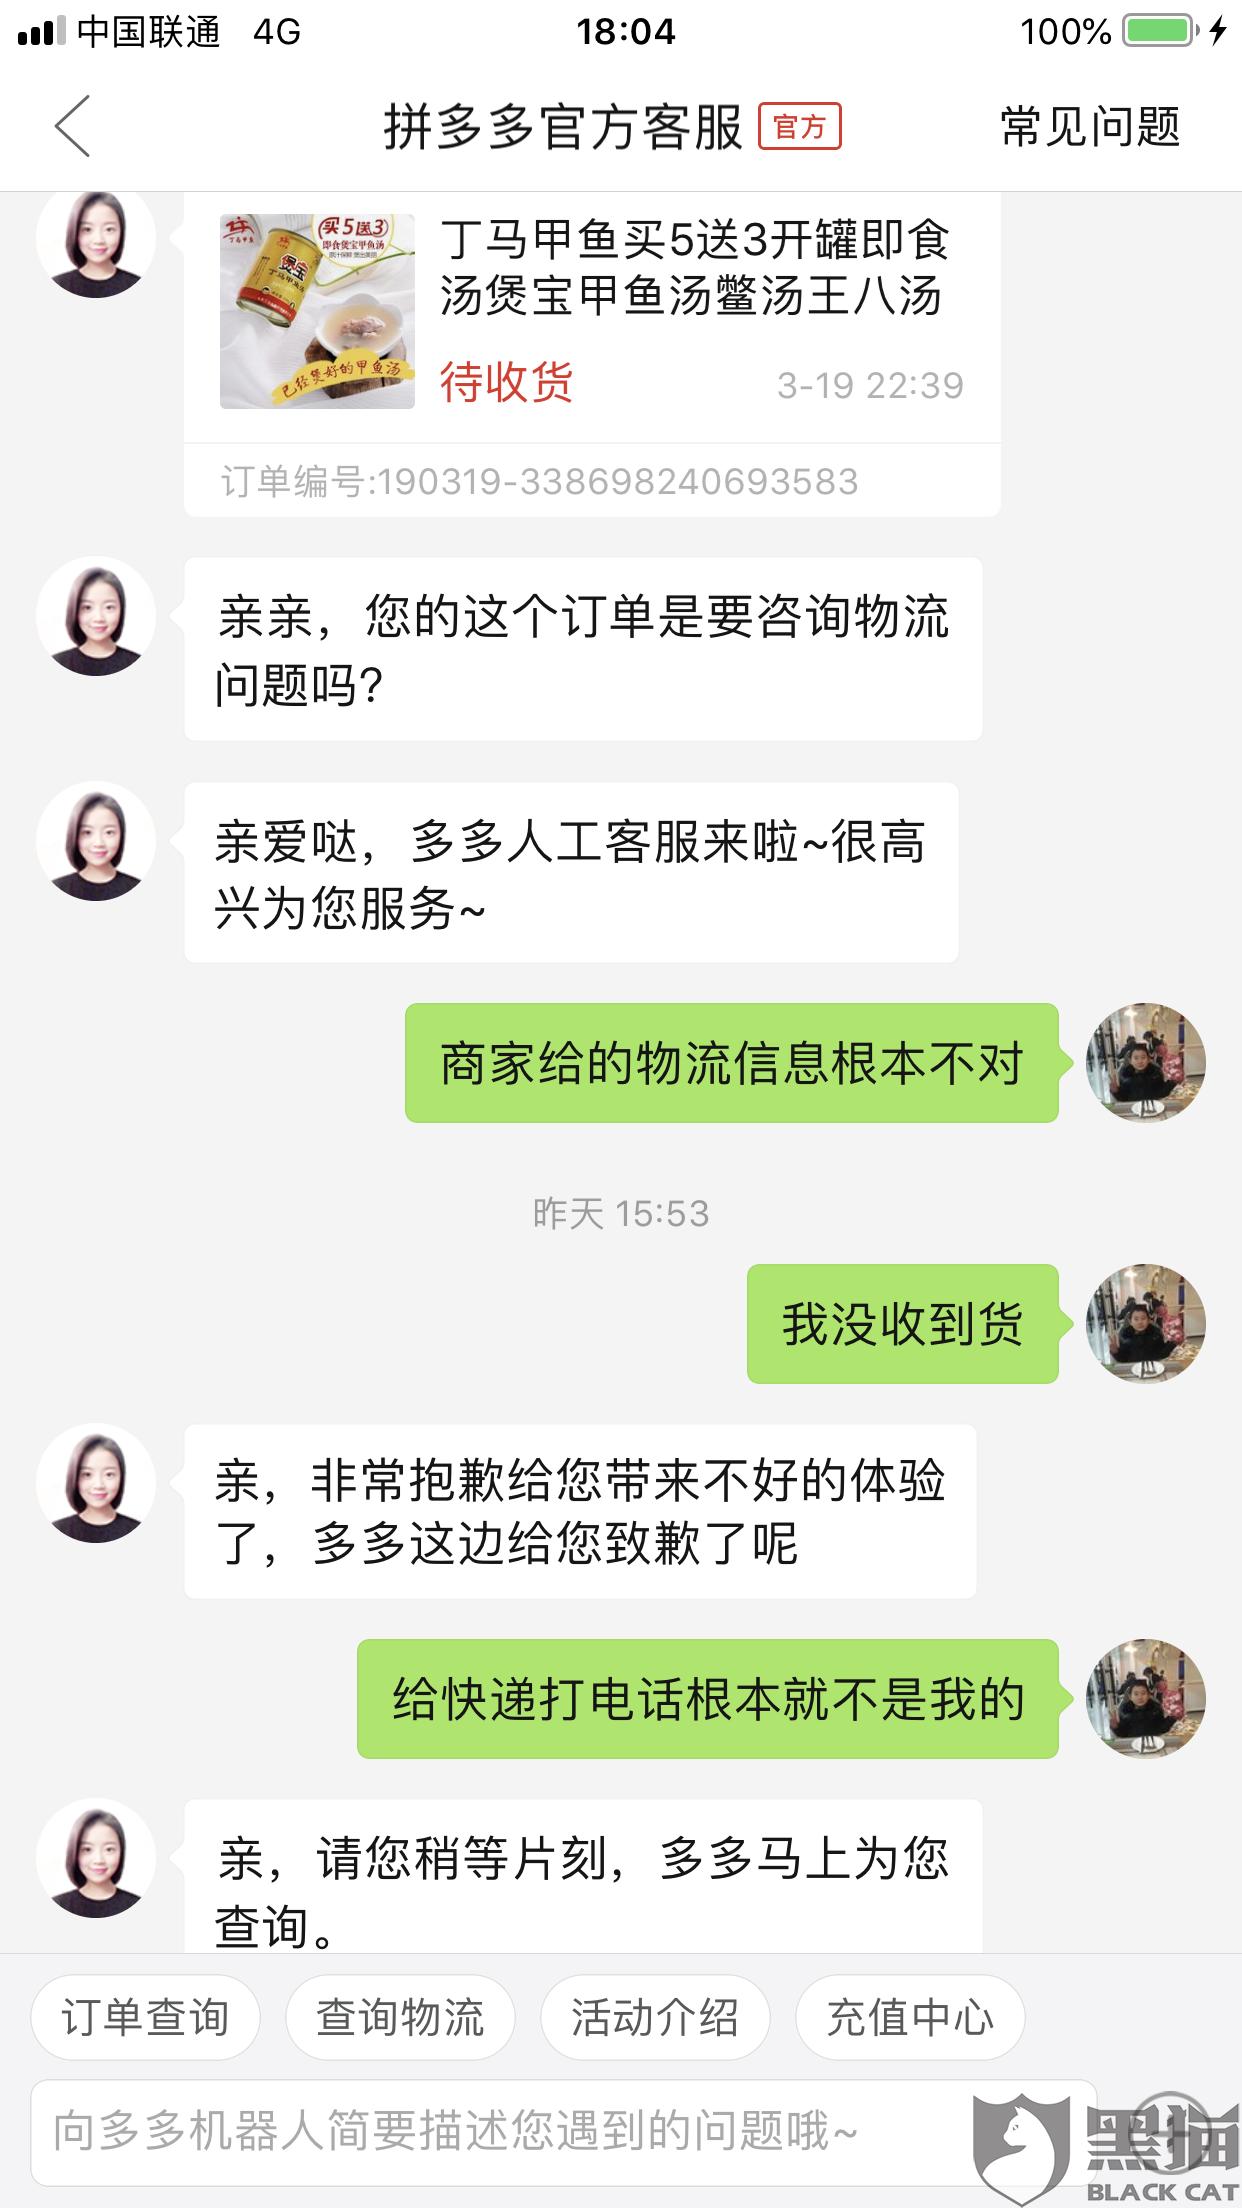 http://www.110tao.com/dianshangrenwu/18930.html